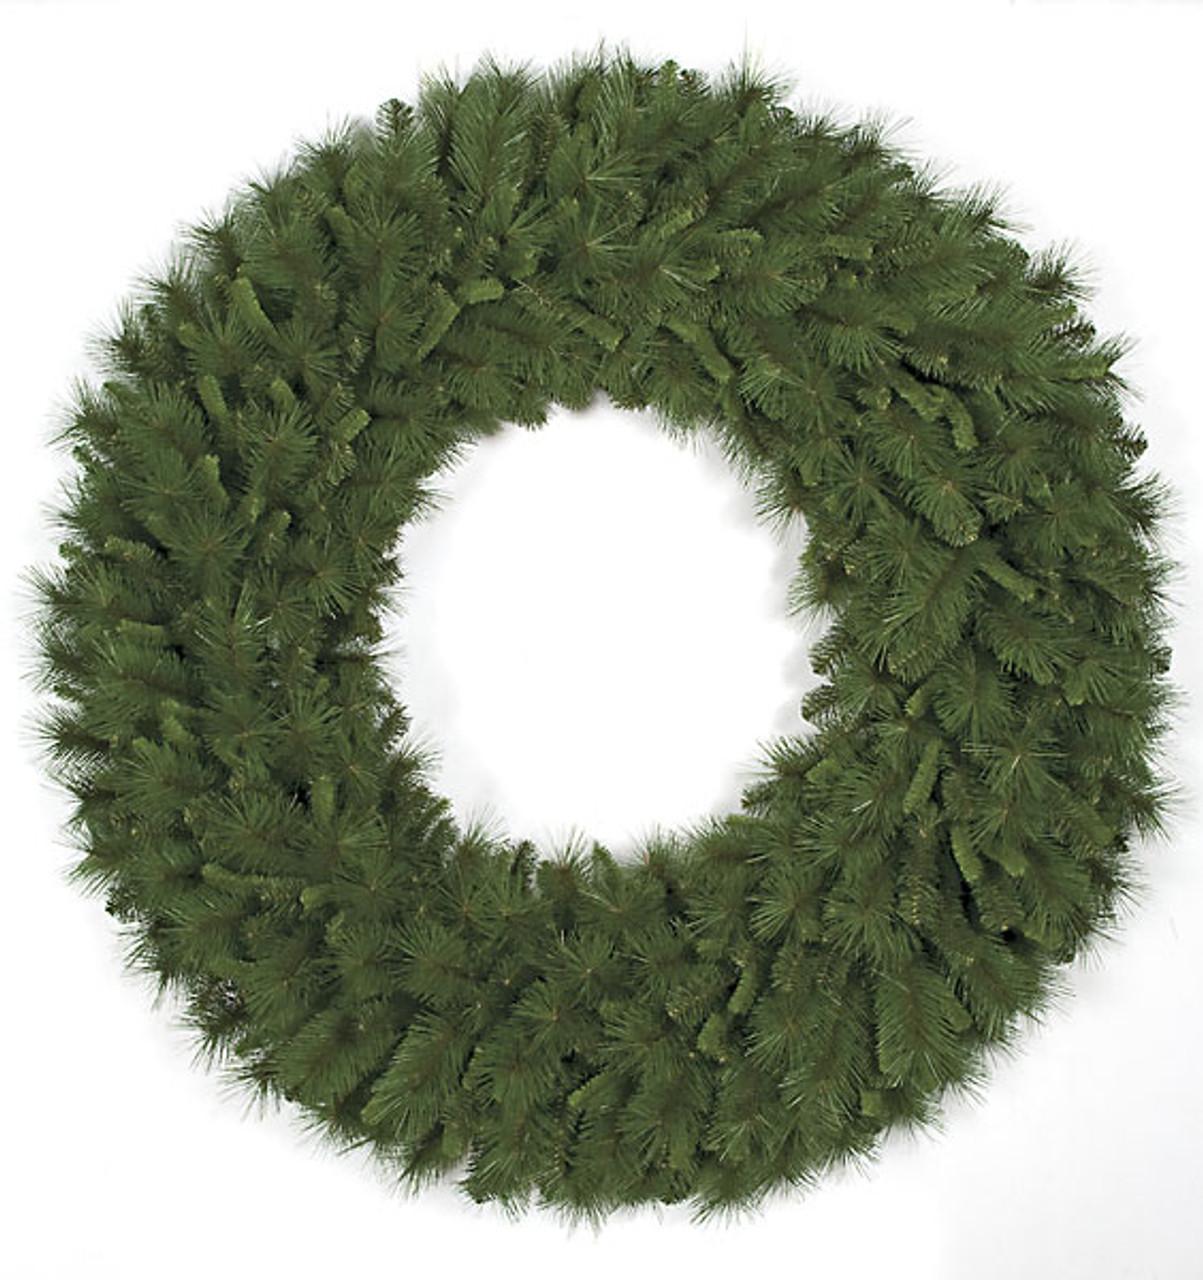 60 Inch Pvc Mixed Pine Wreath Autograph Foliages